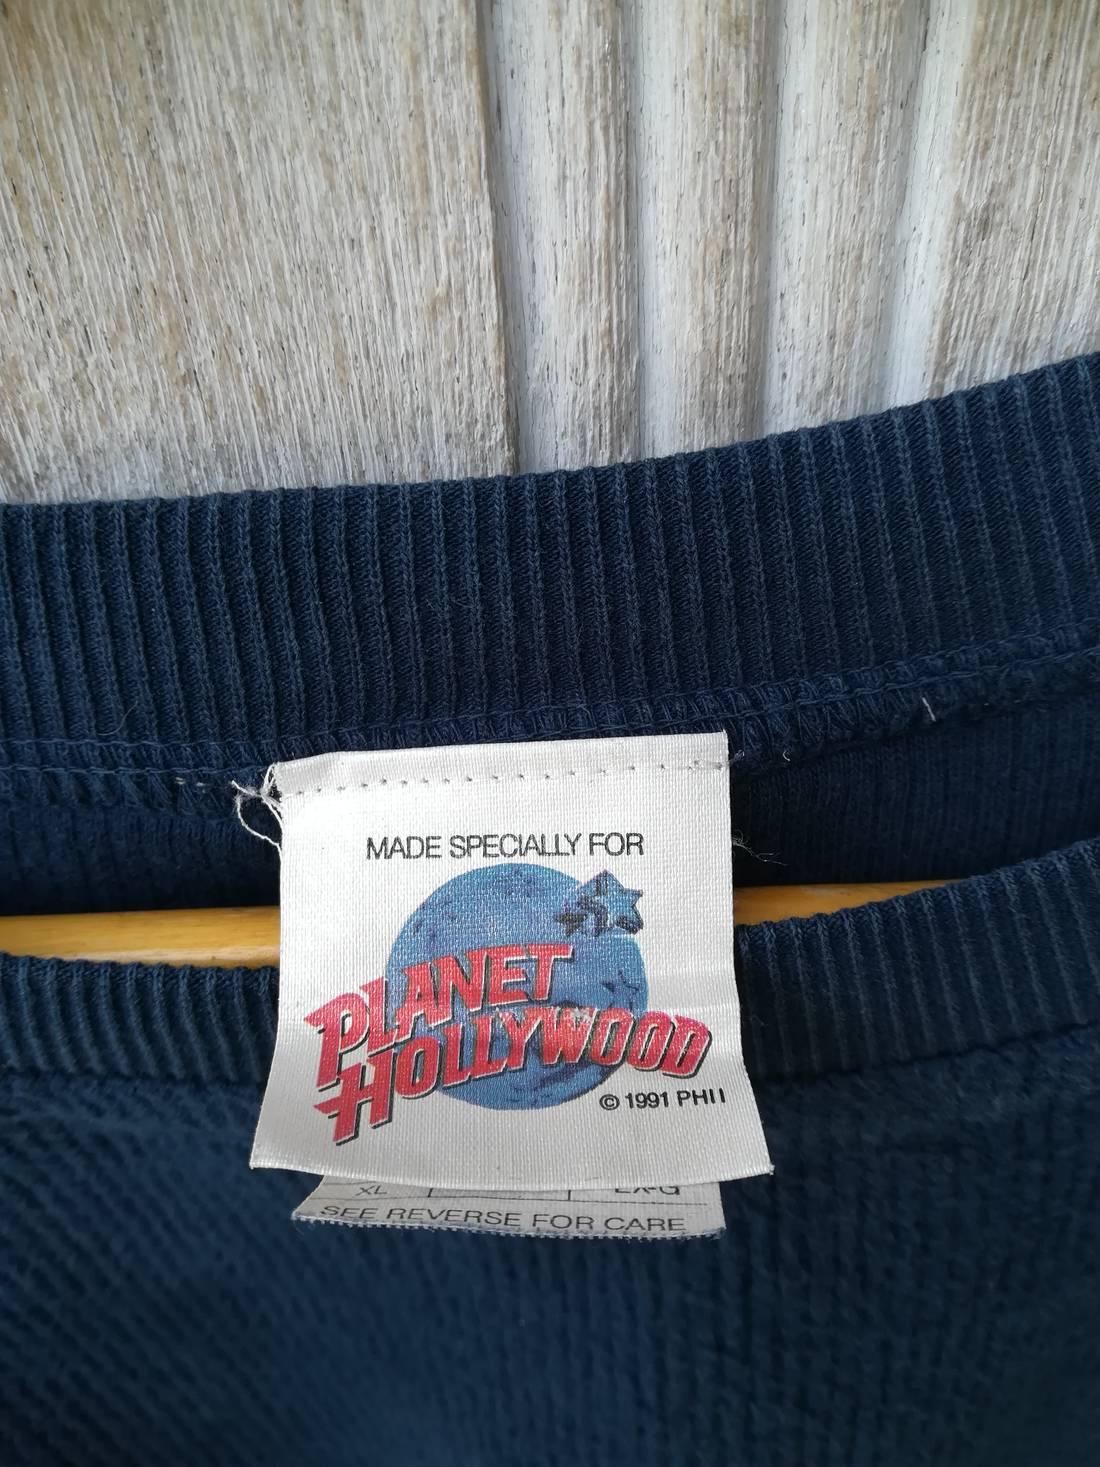 Vintage San Antonio Embroidery Logo Sweatshirt Size Xl Sweatshirts